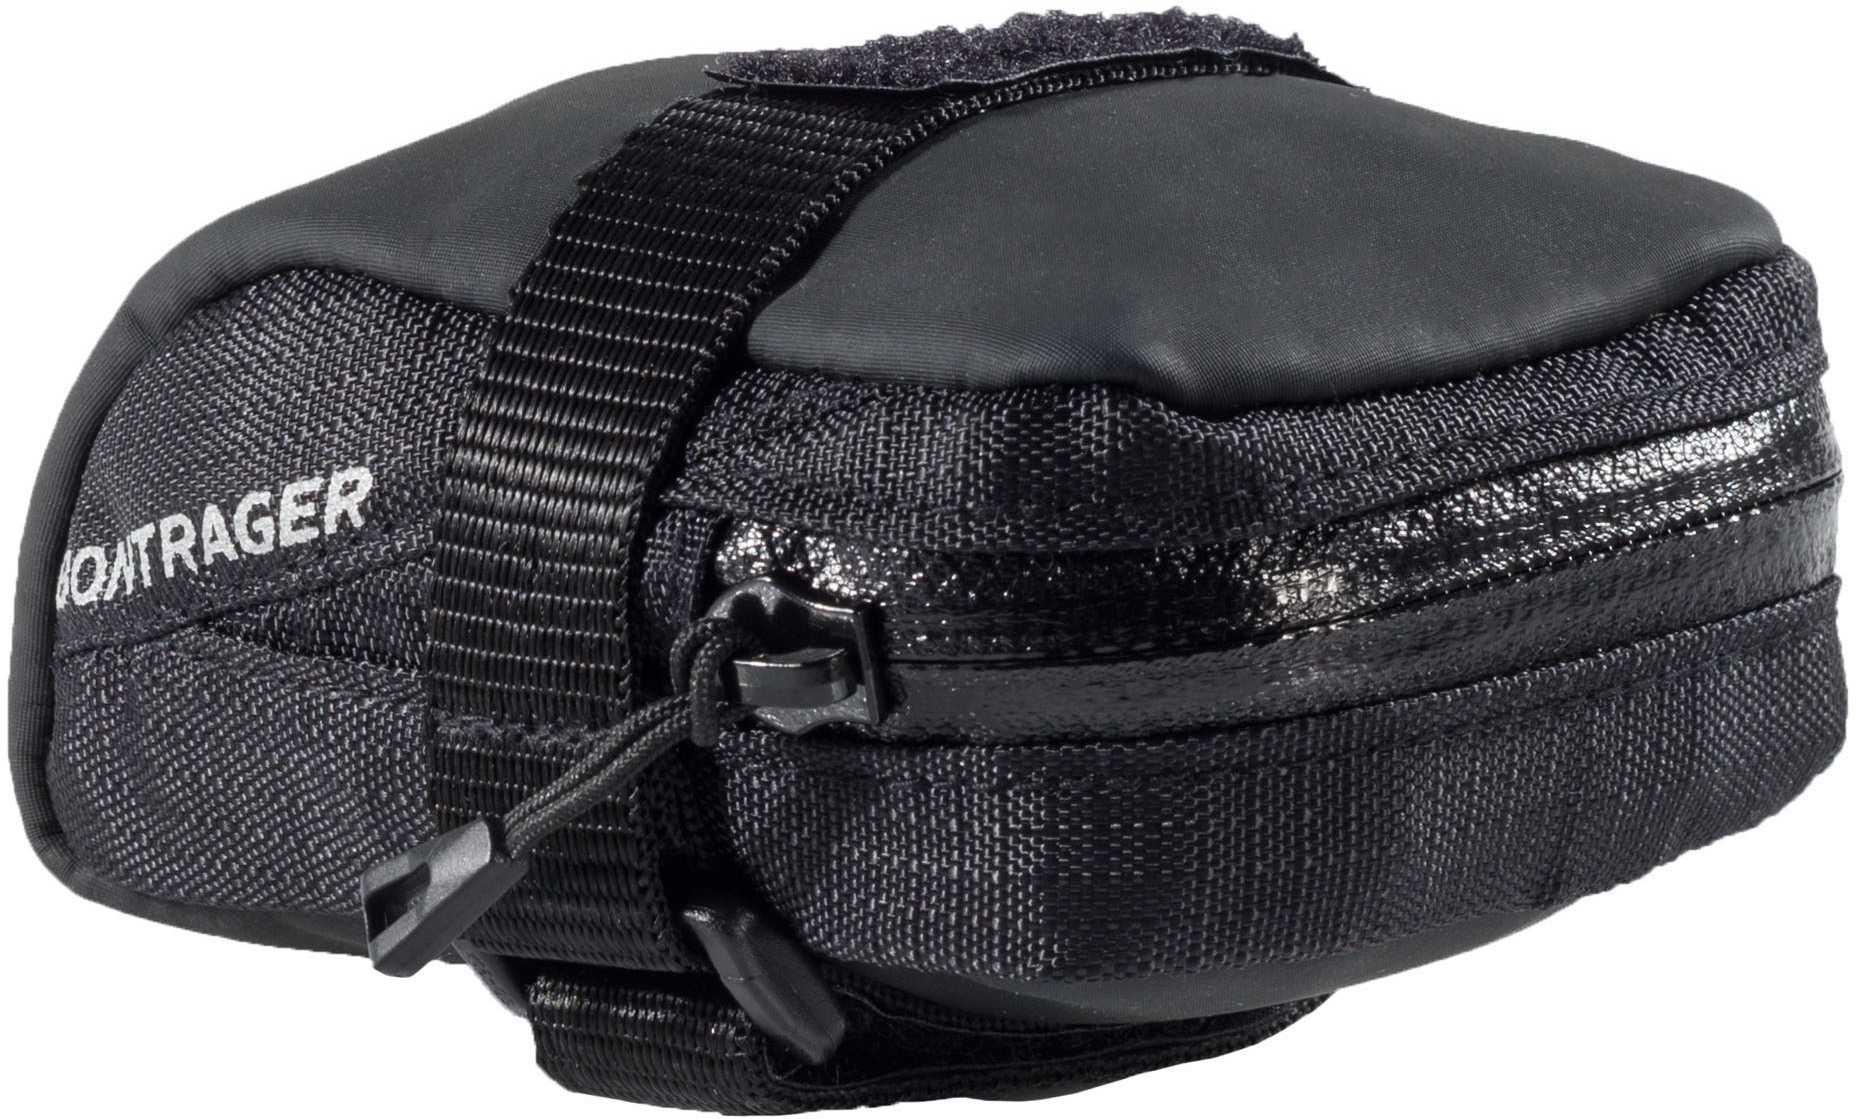 Bontrager Elite - Sort - Micro. | Saddle bags